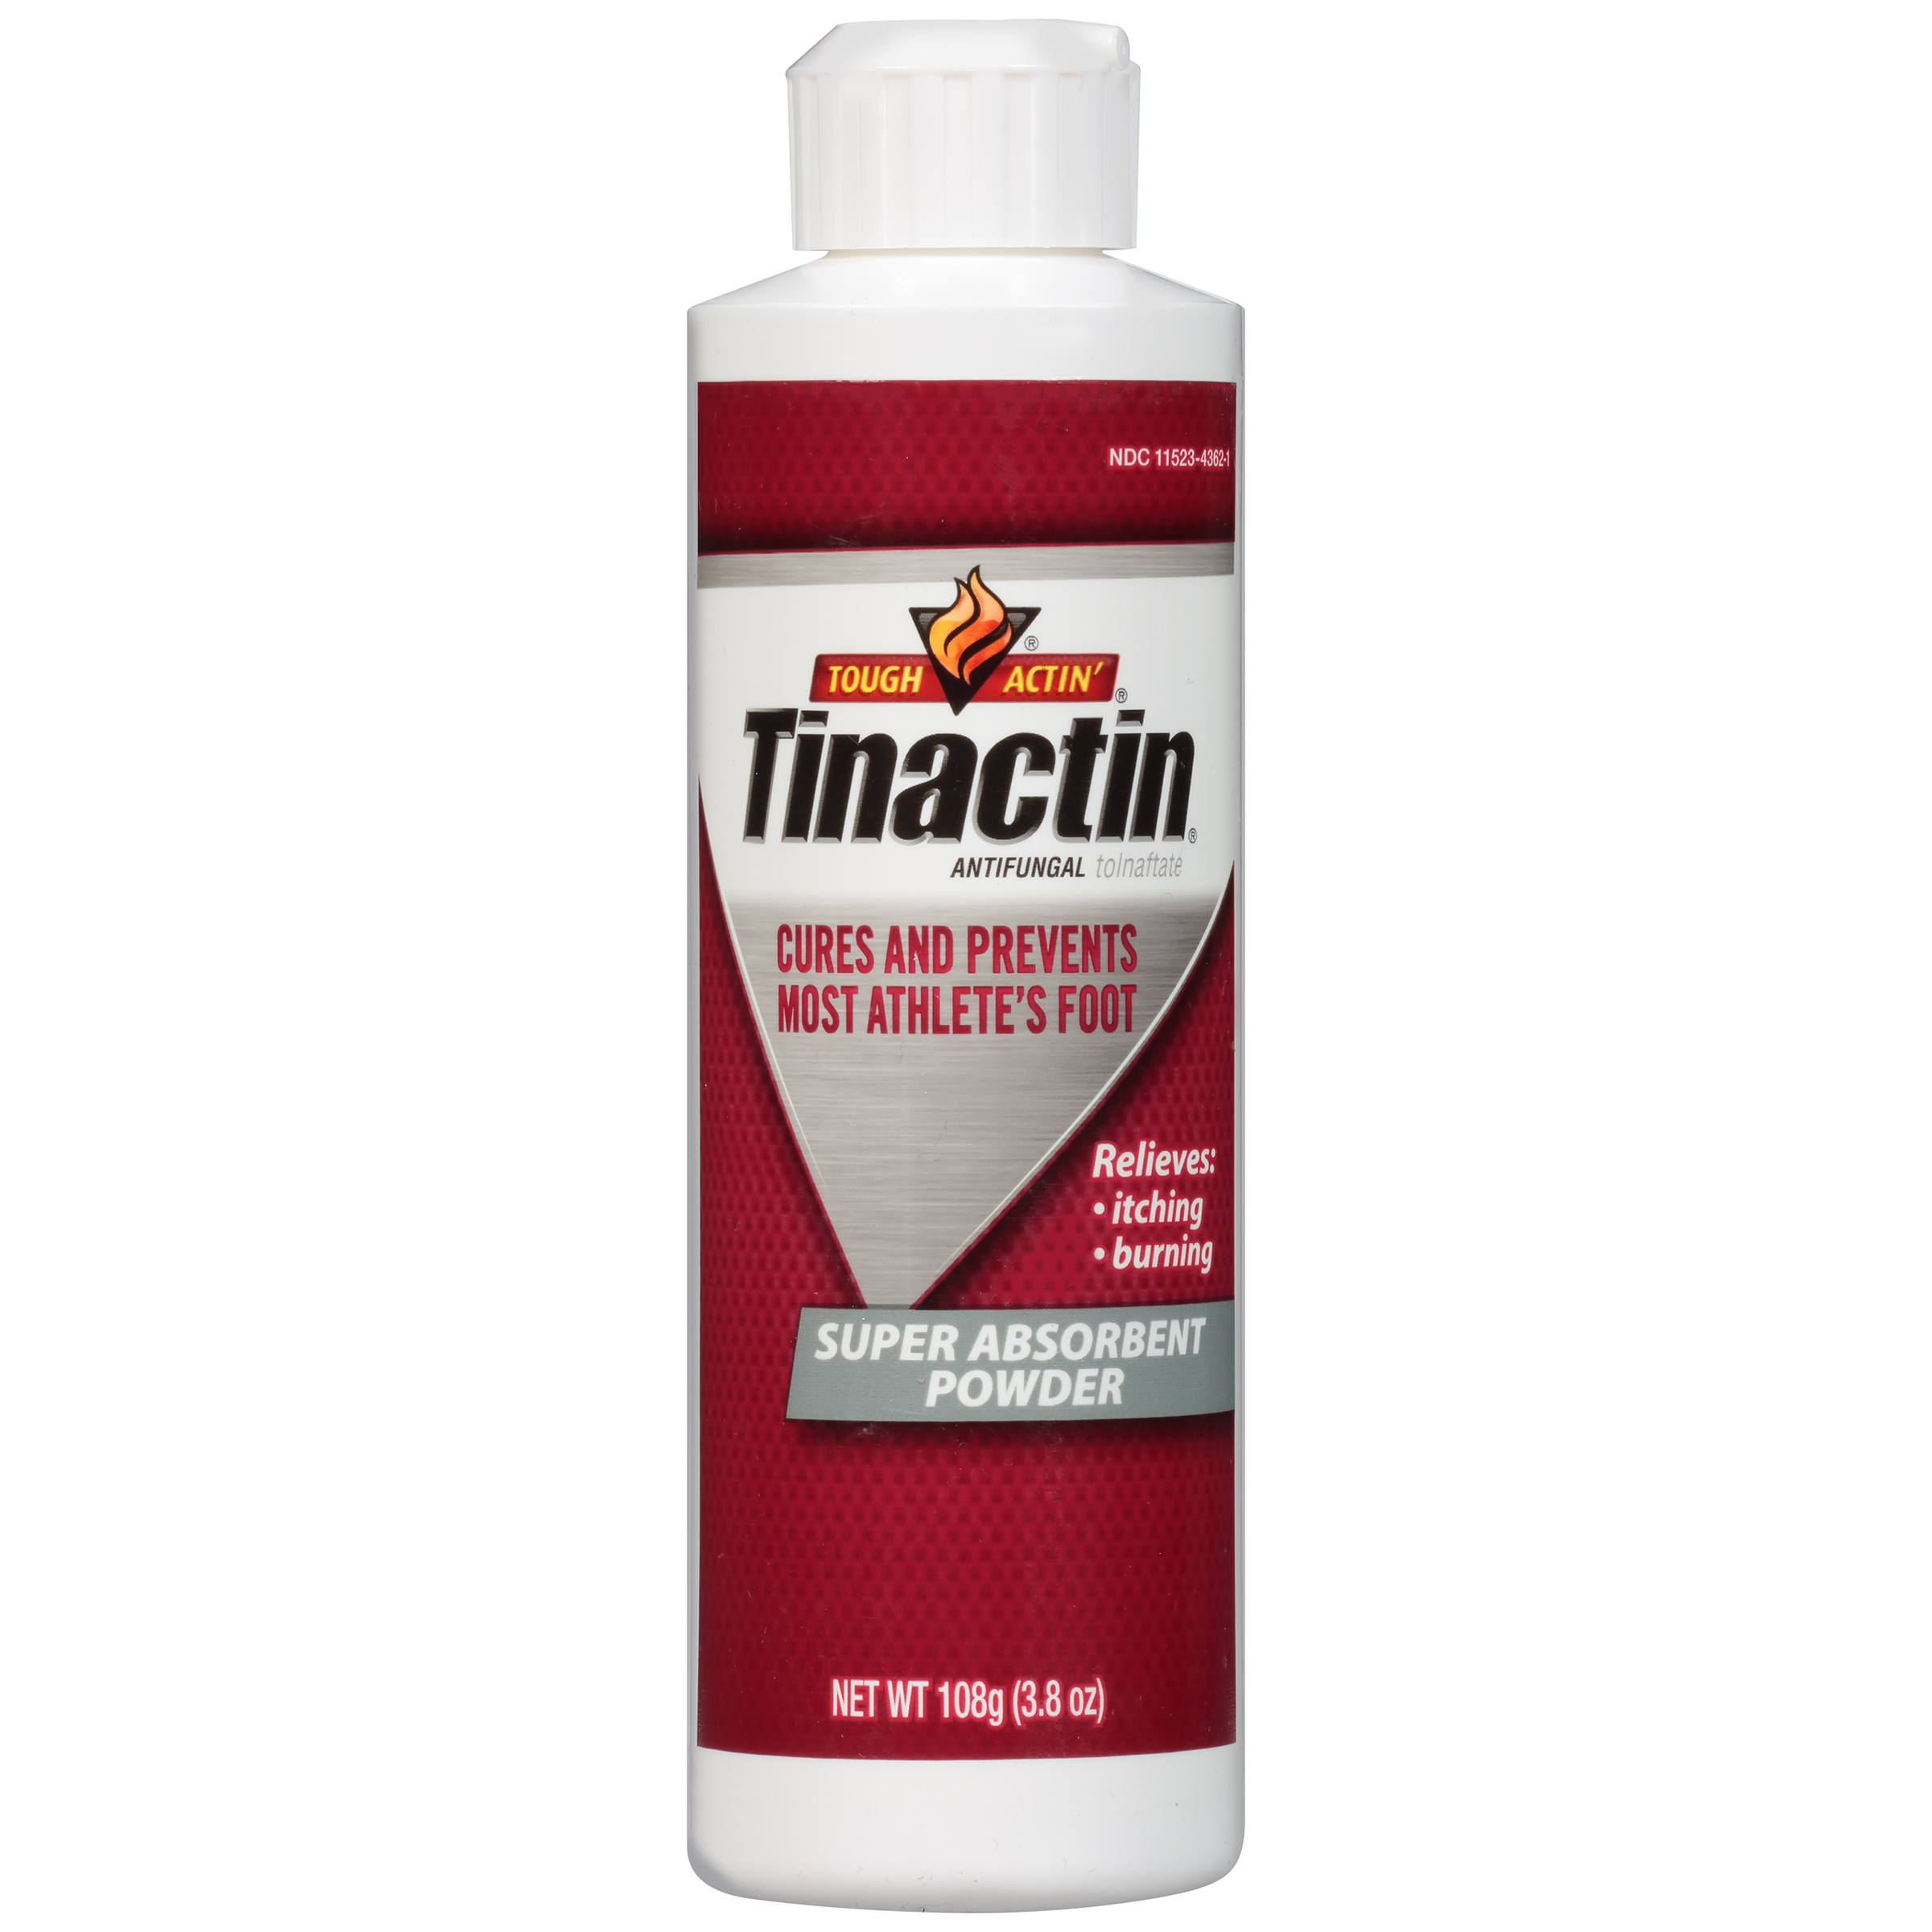 Tinactin Shaker Powder